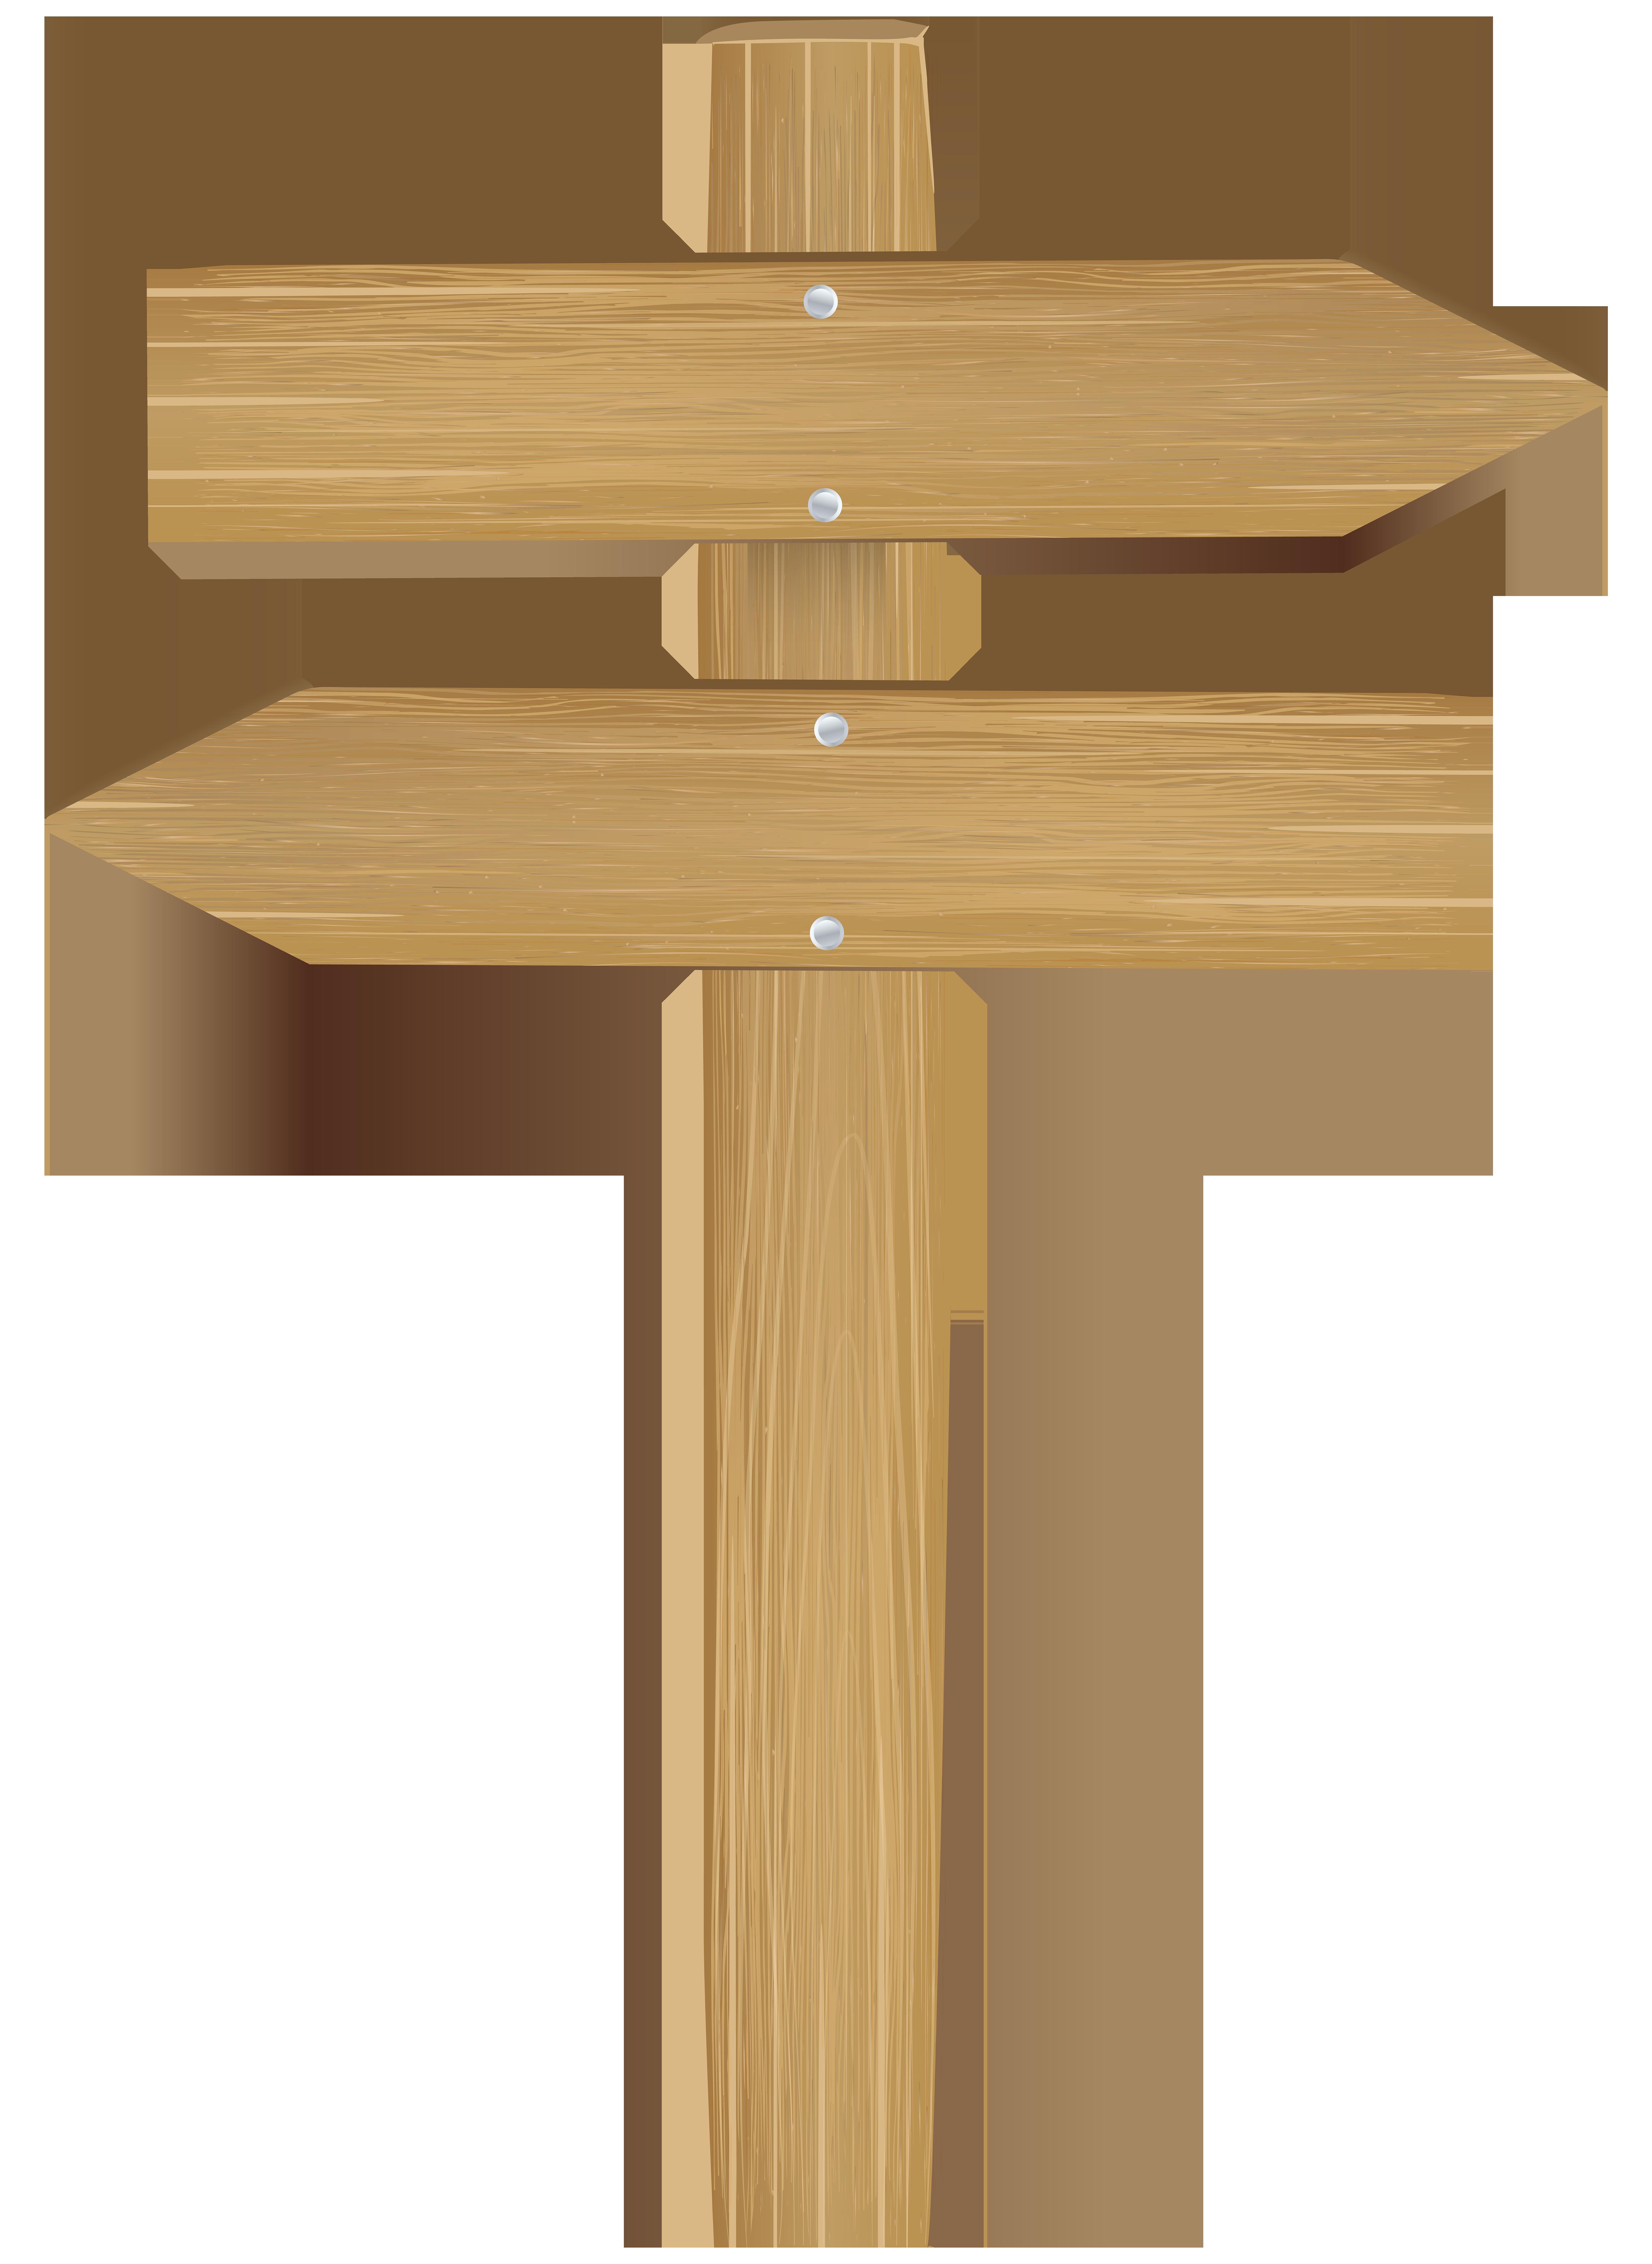 Double Wooden Arrow Sign PNG Clip Art.